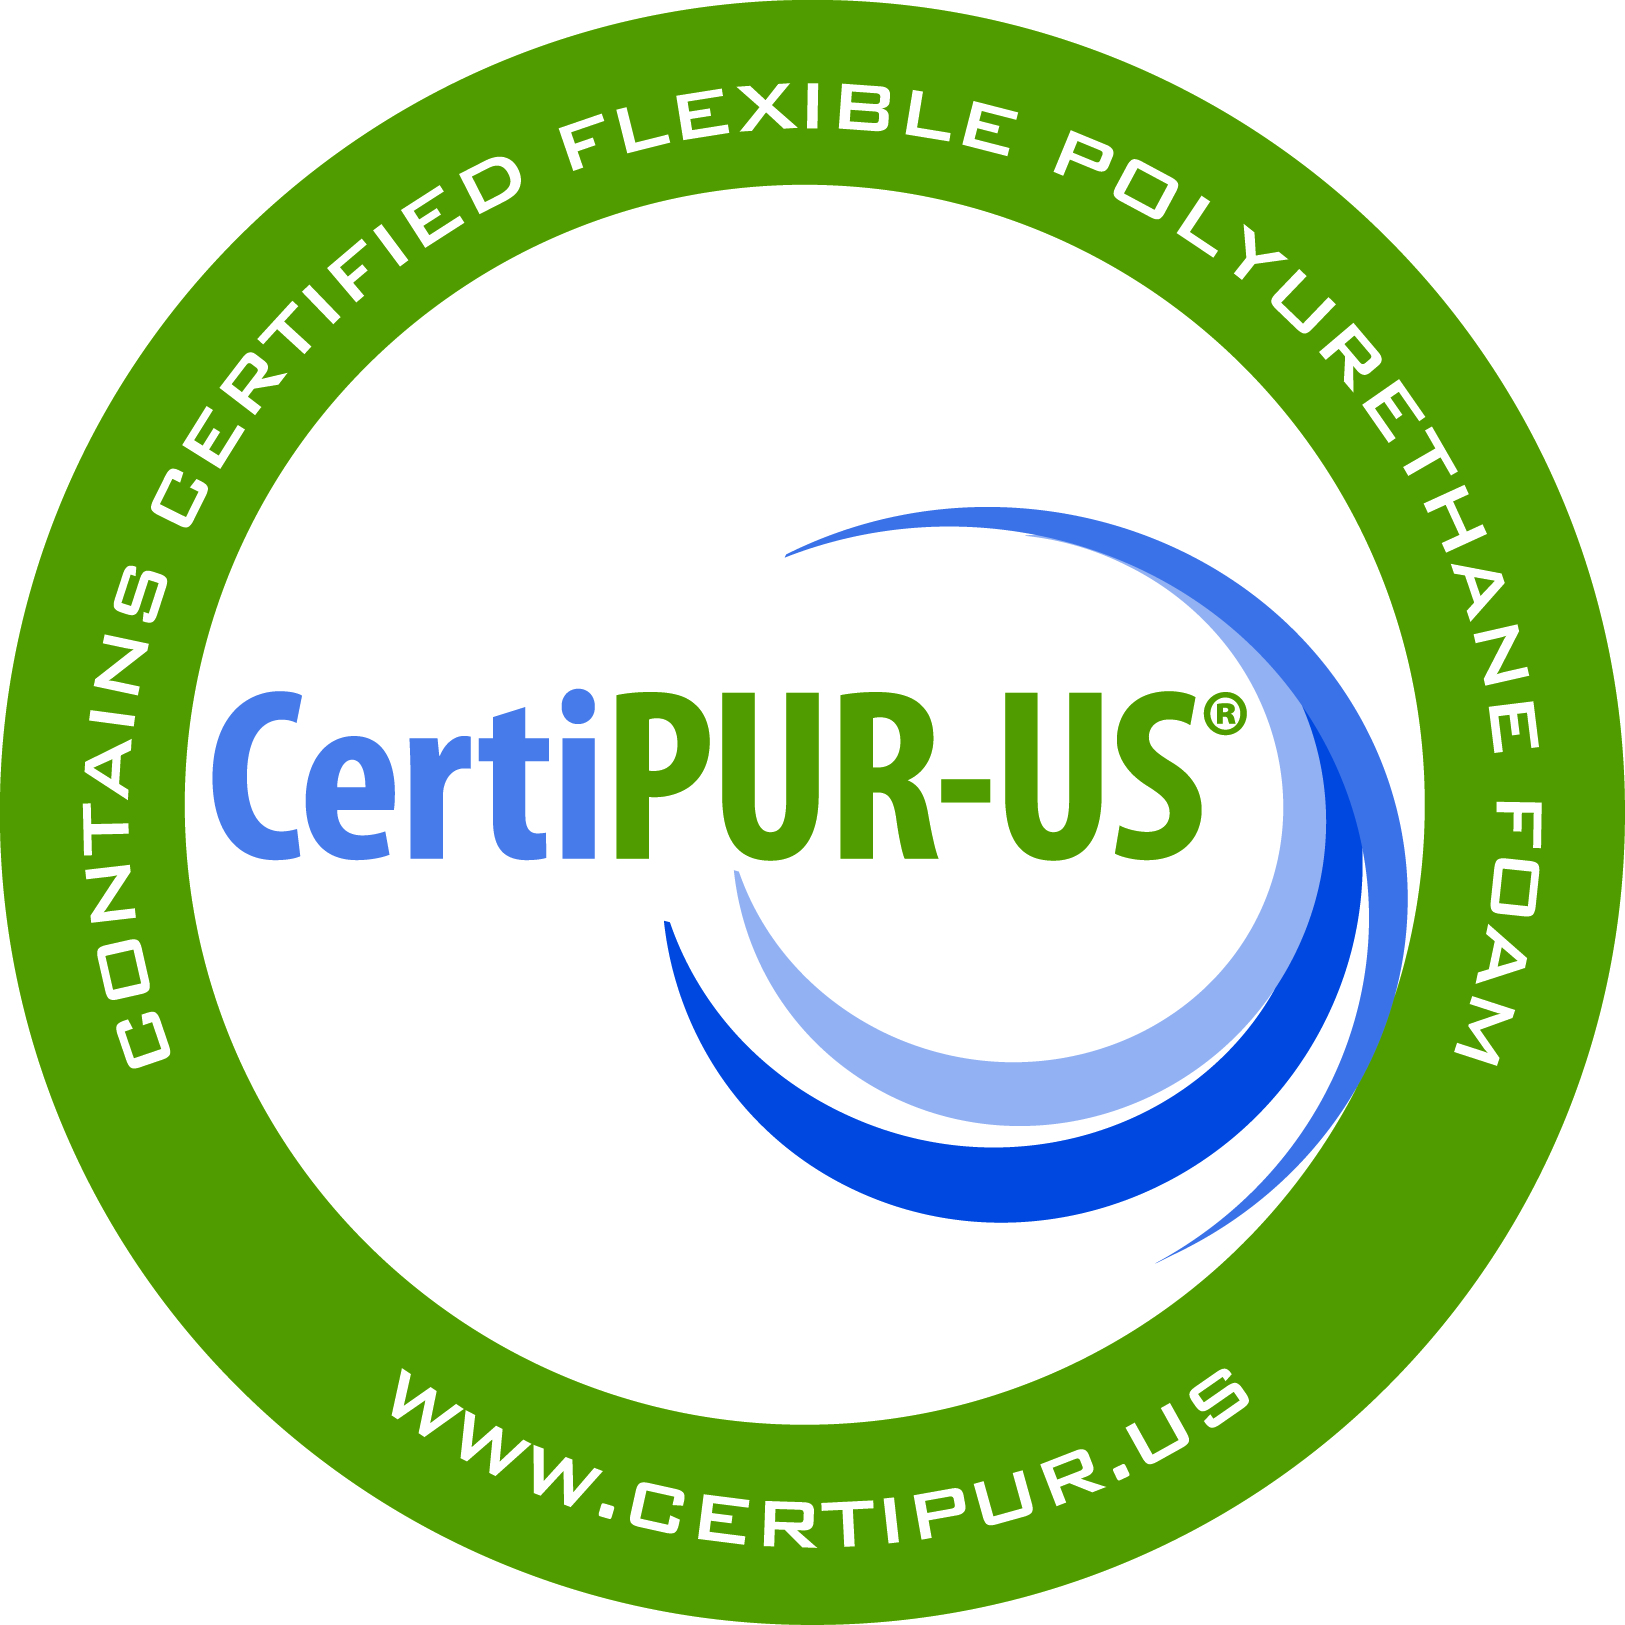 certipur-us-contains-foam.jpg